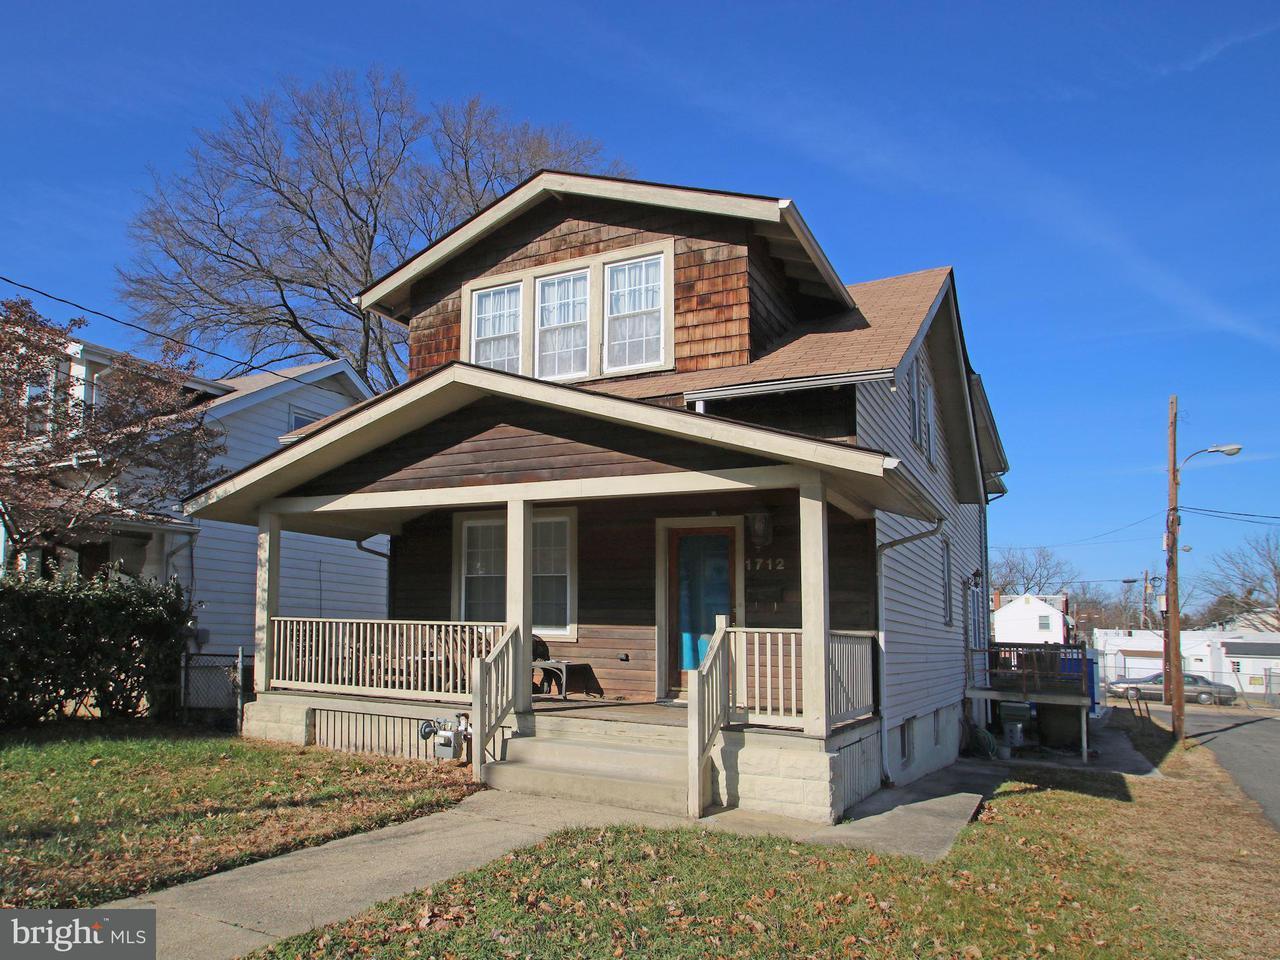 Casa Unifamiliar por un Venta en 1712 Monroe St Ne 1712 Monroe St Ne Washington, Distrito De Columbia 20018 Estados Unidos